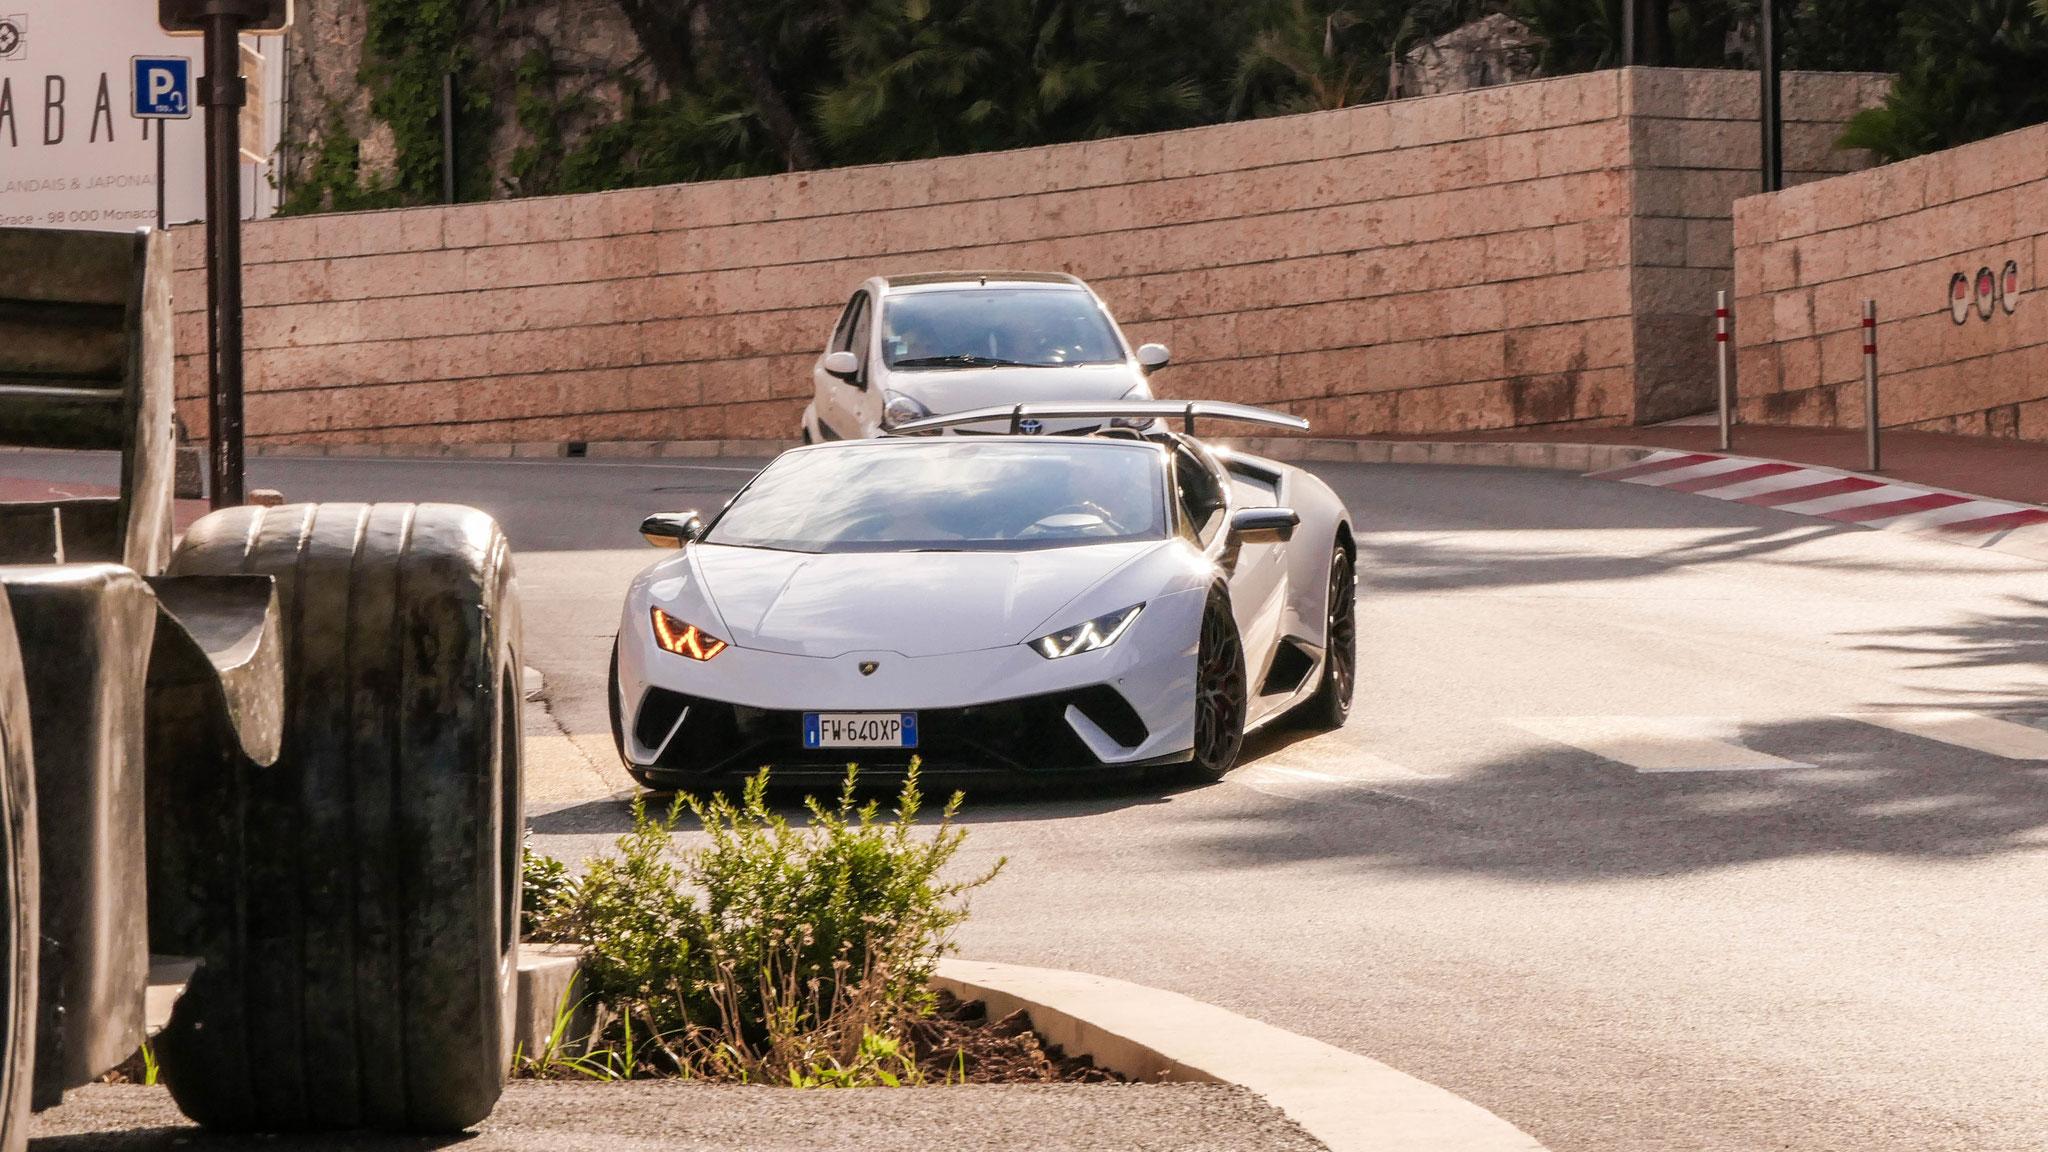 Lamborghini Huracan Performante - FW-640-XP (ITA)